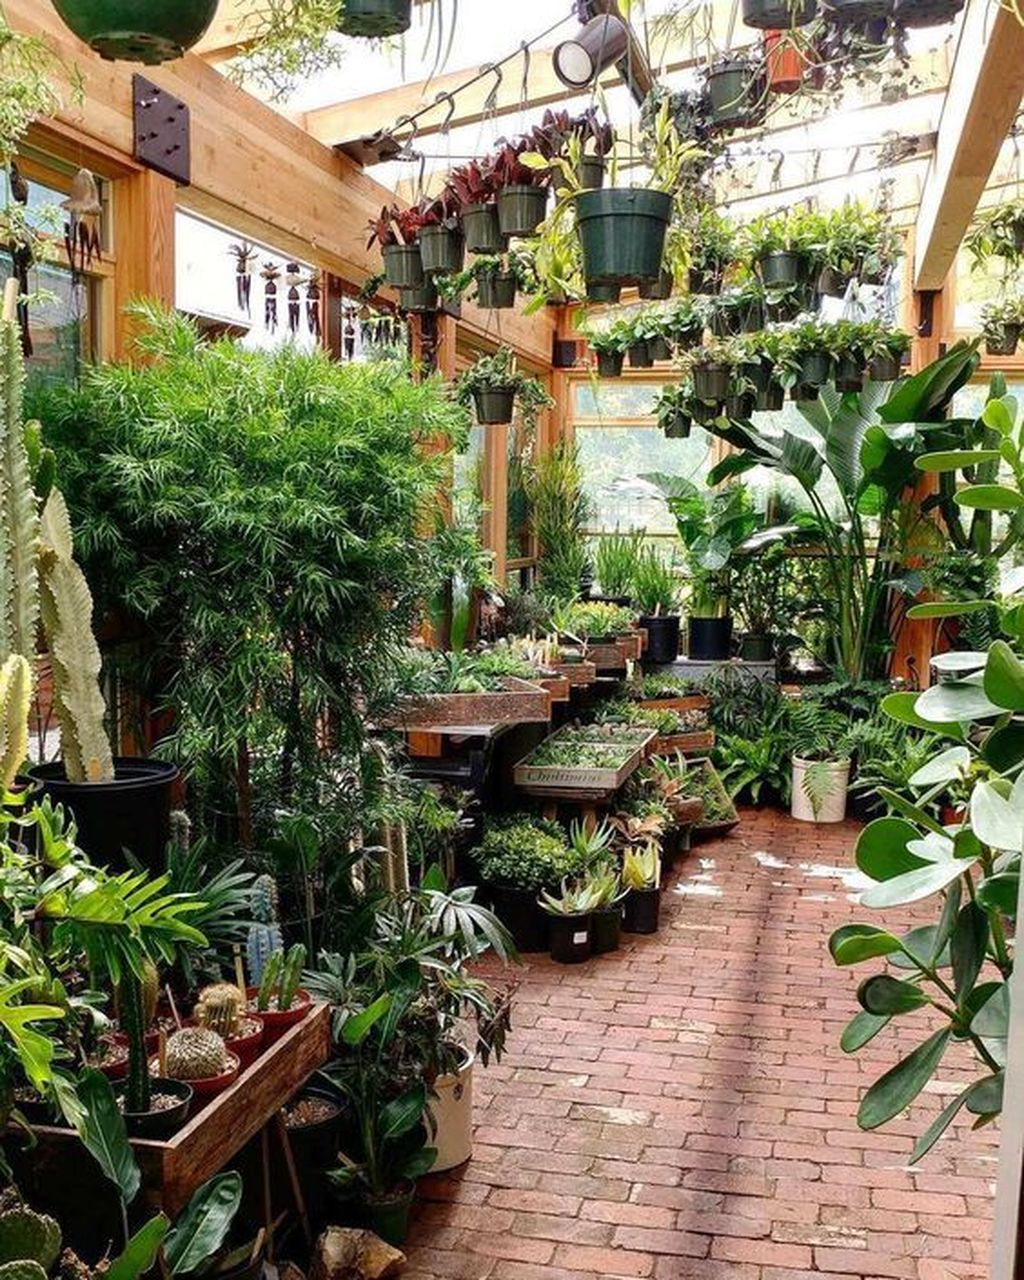 The Best Indoor Garden Ideas To Beautify Your Home 21